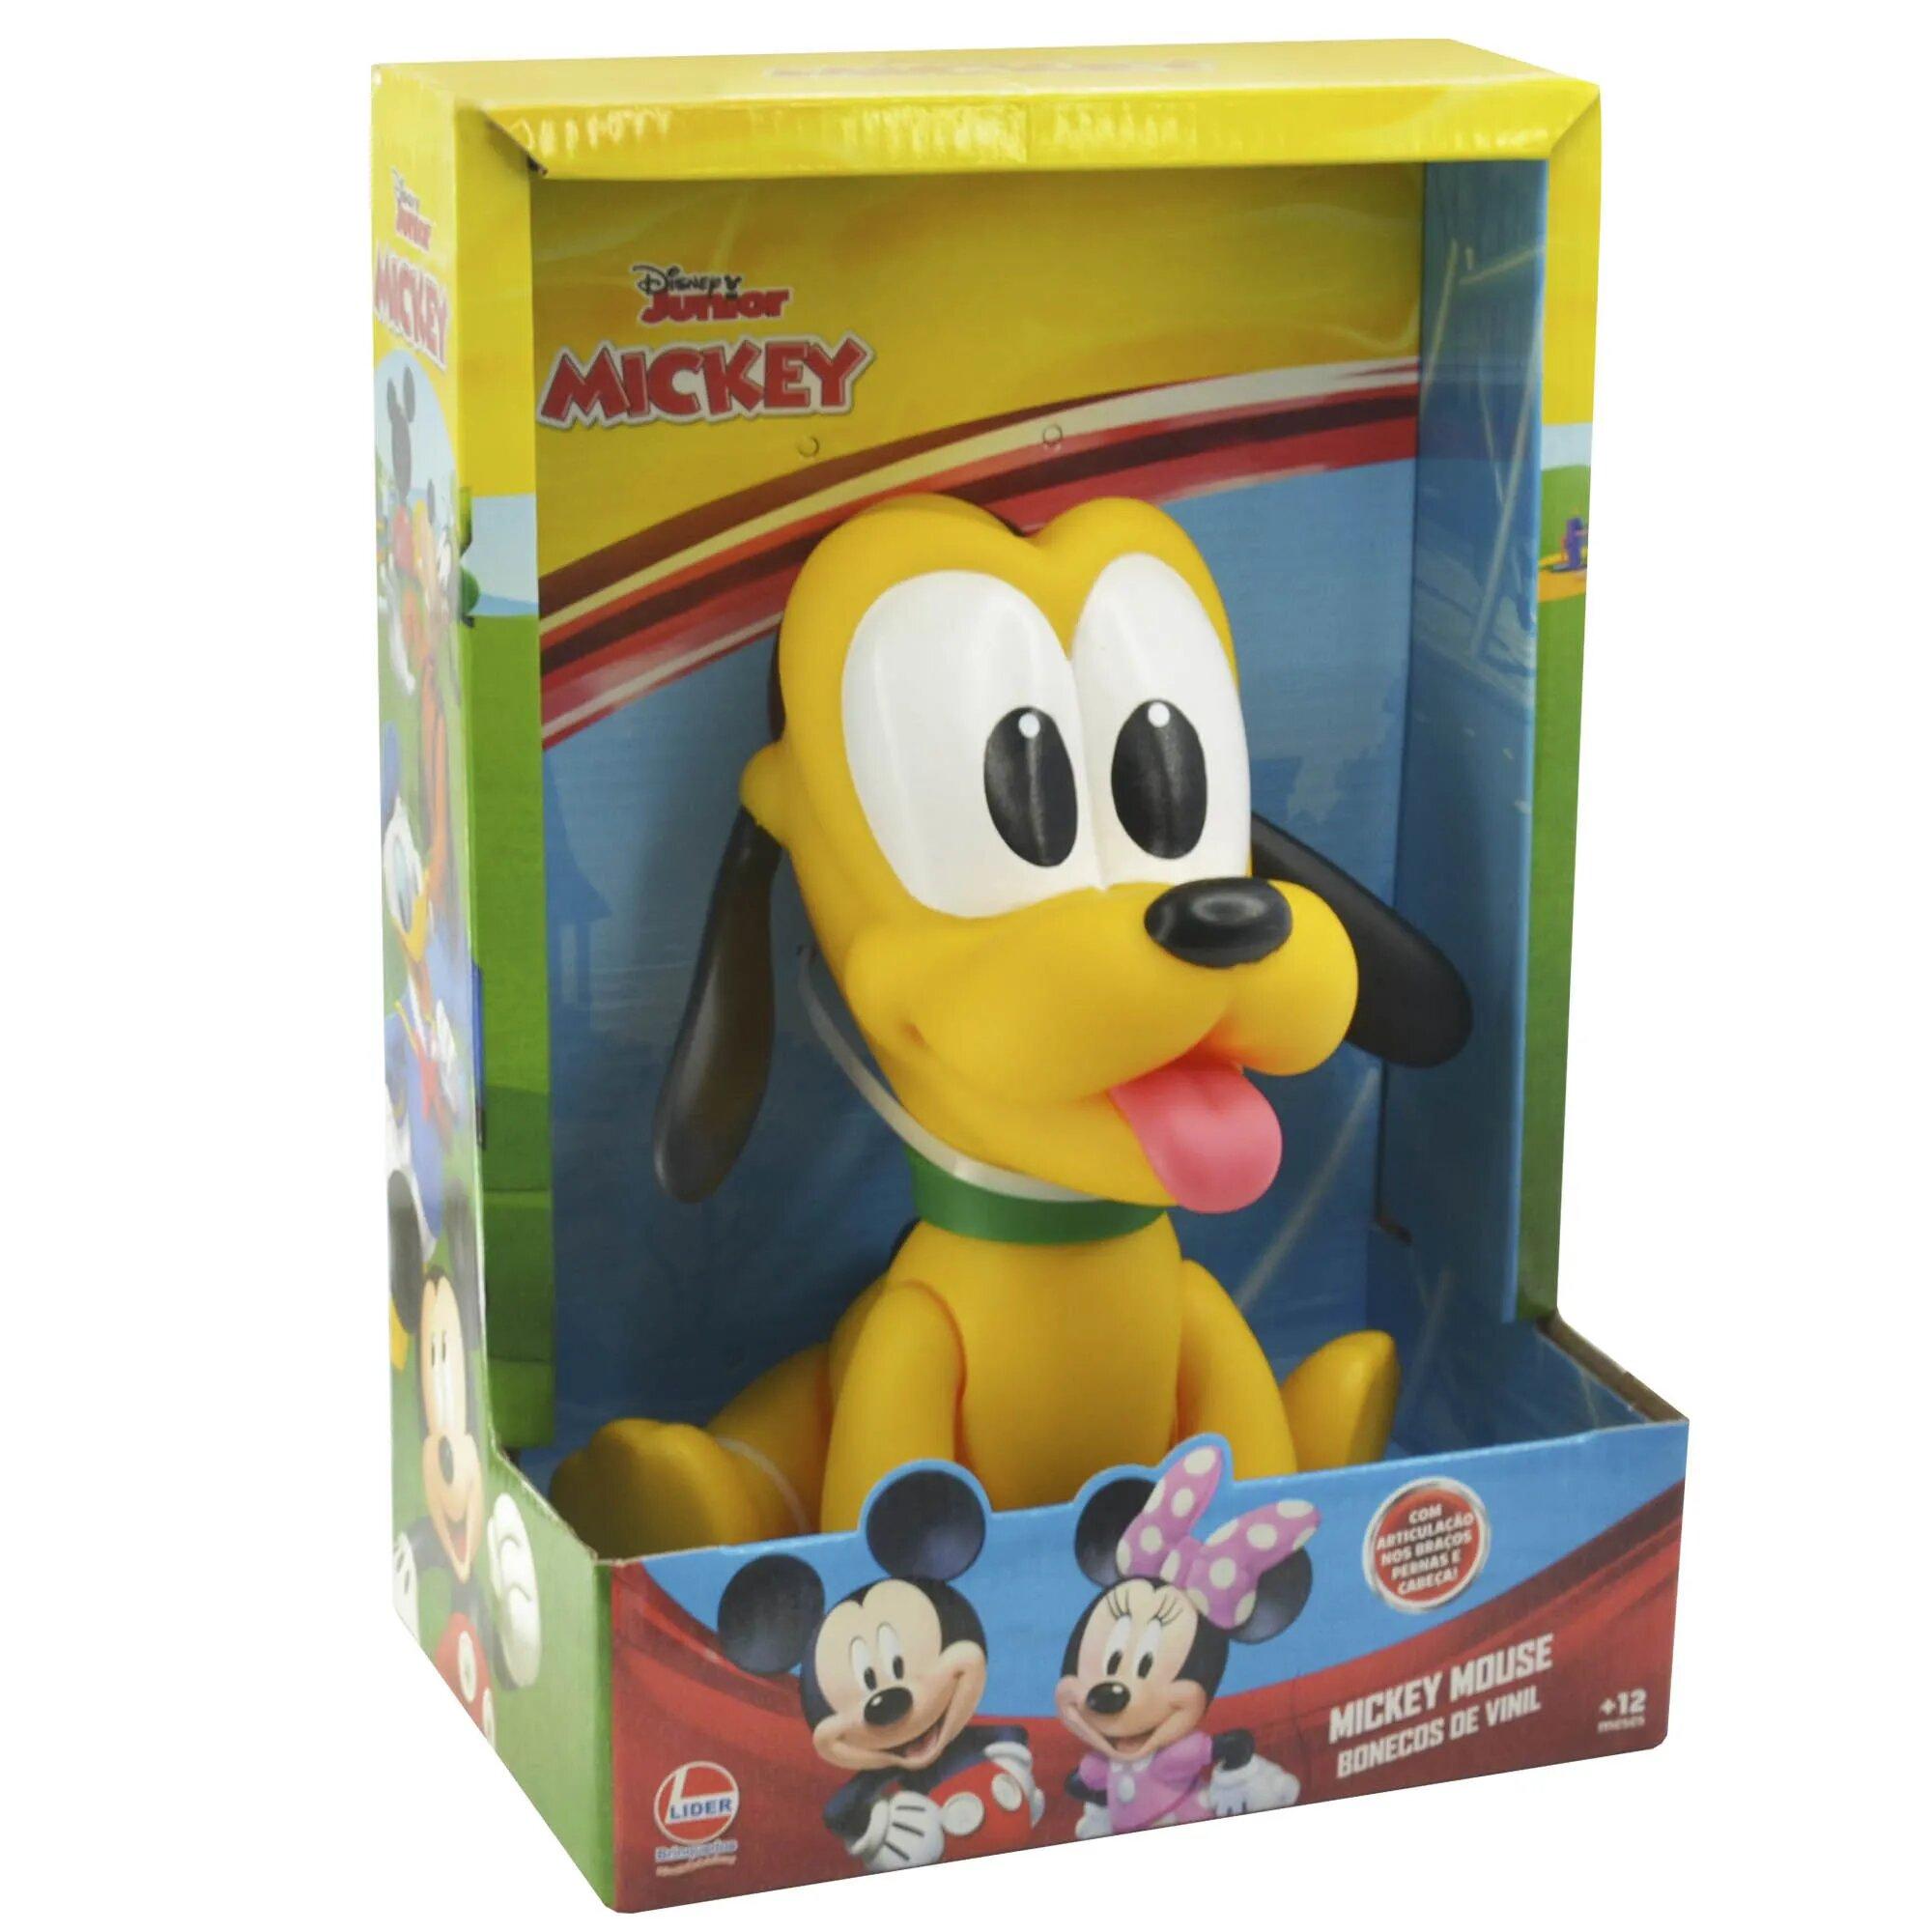 Boneco Vinil: Pluto Baby (Disney) - Lider